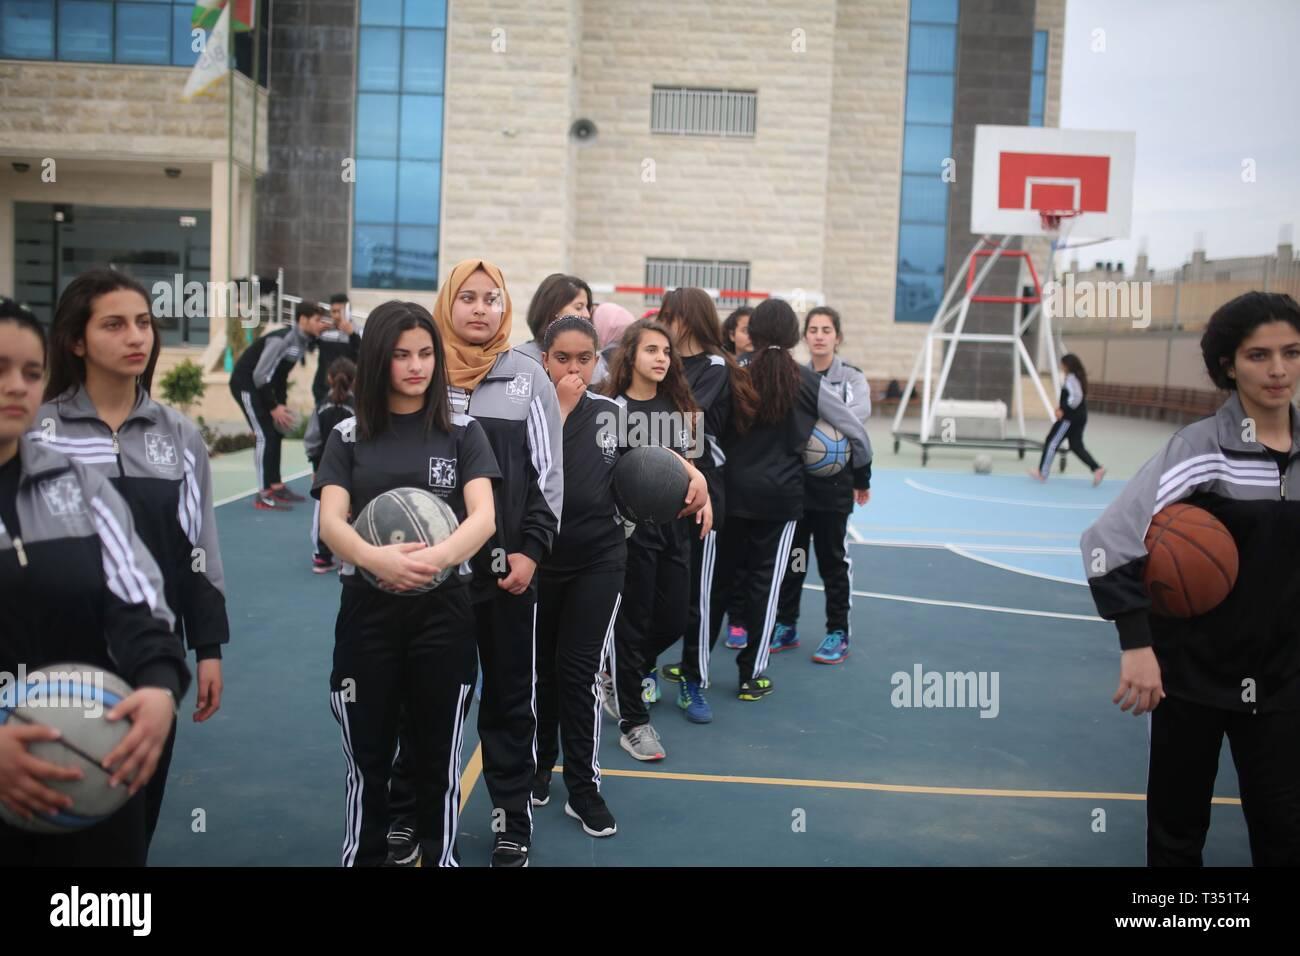 Girl's Basketball Stock Photos & Girl's Basketball Stock